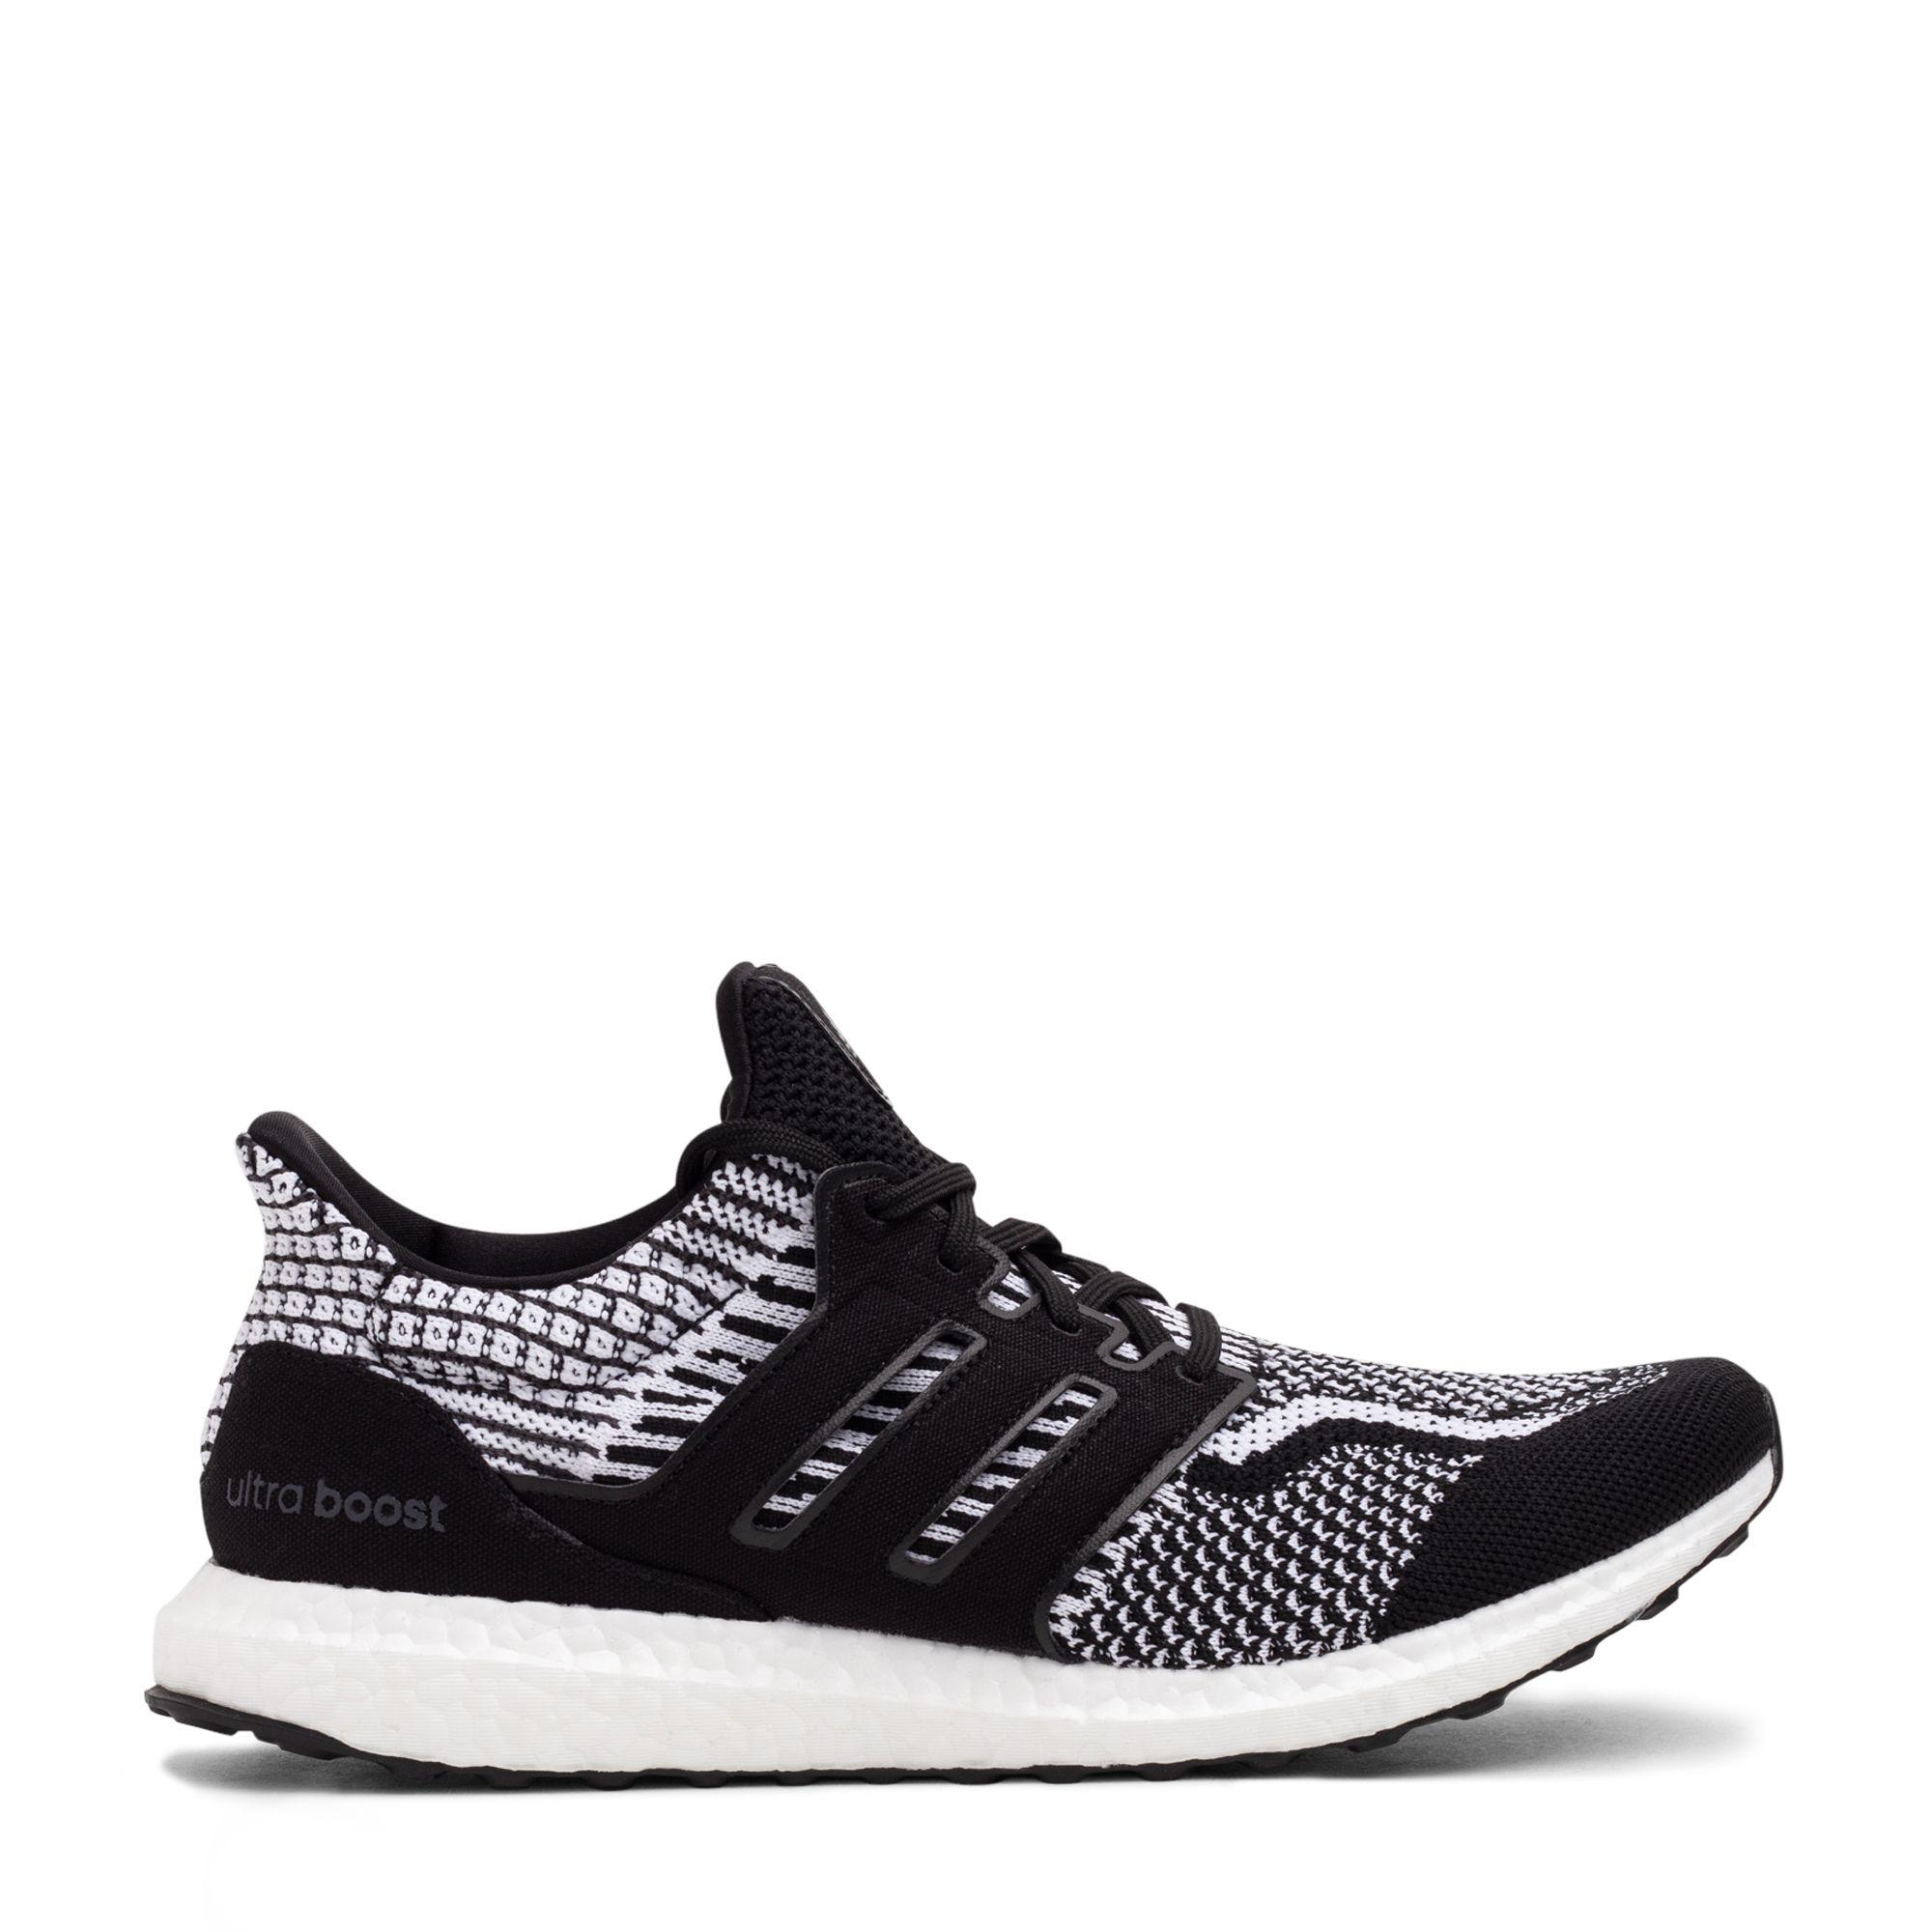 Ultraboost 5.0 DNA sneakers